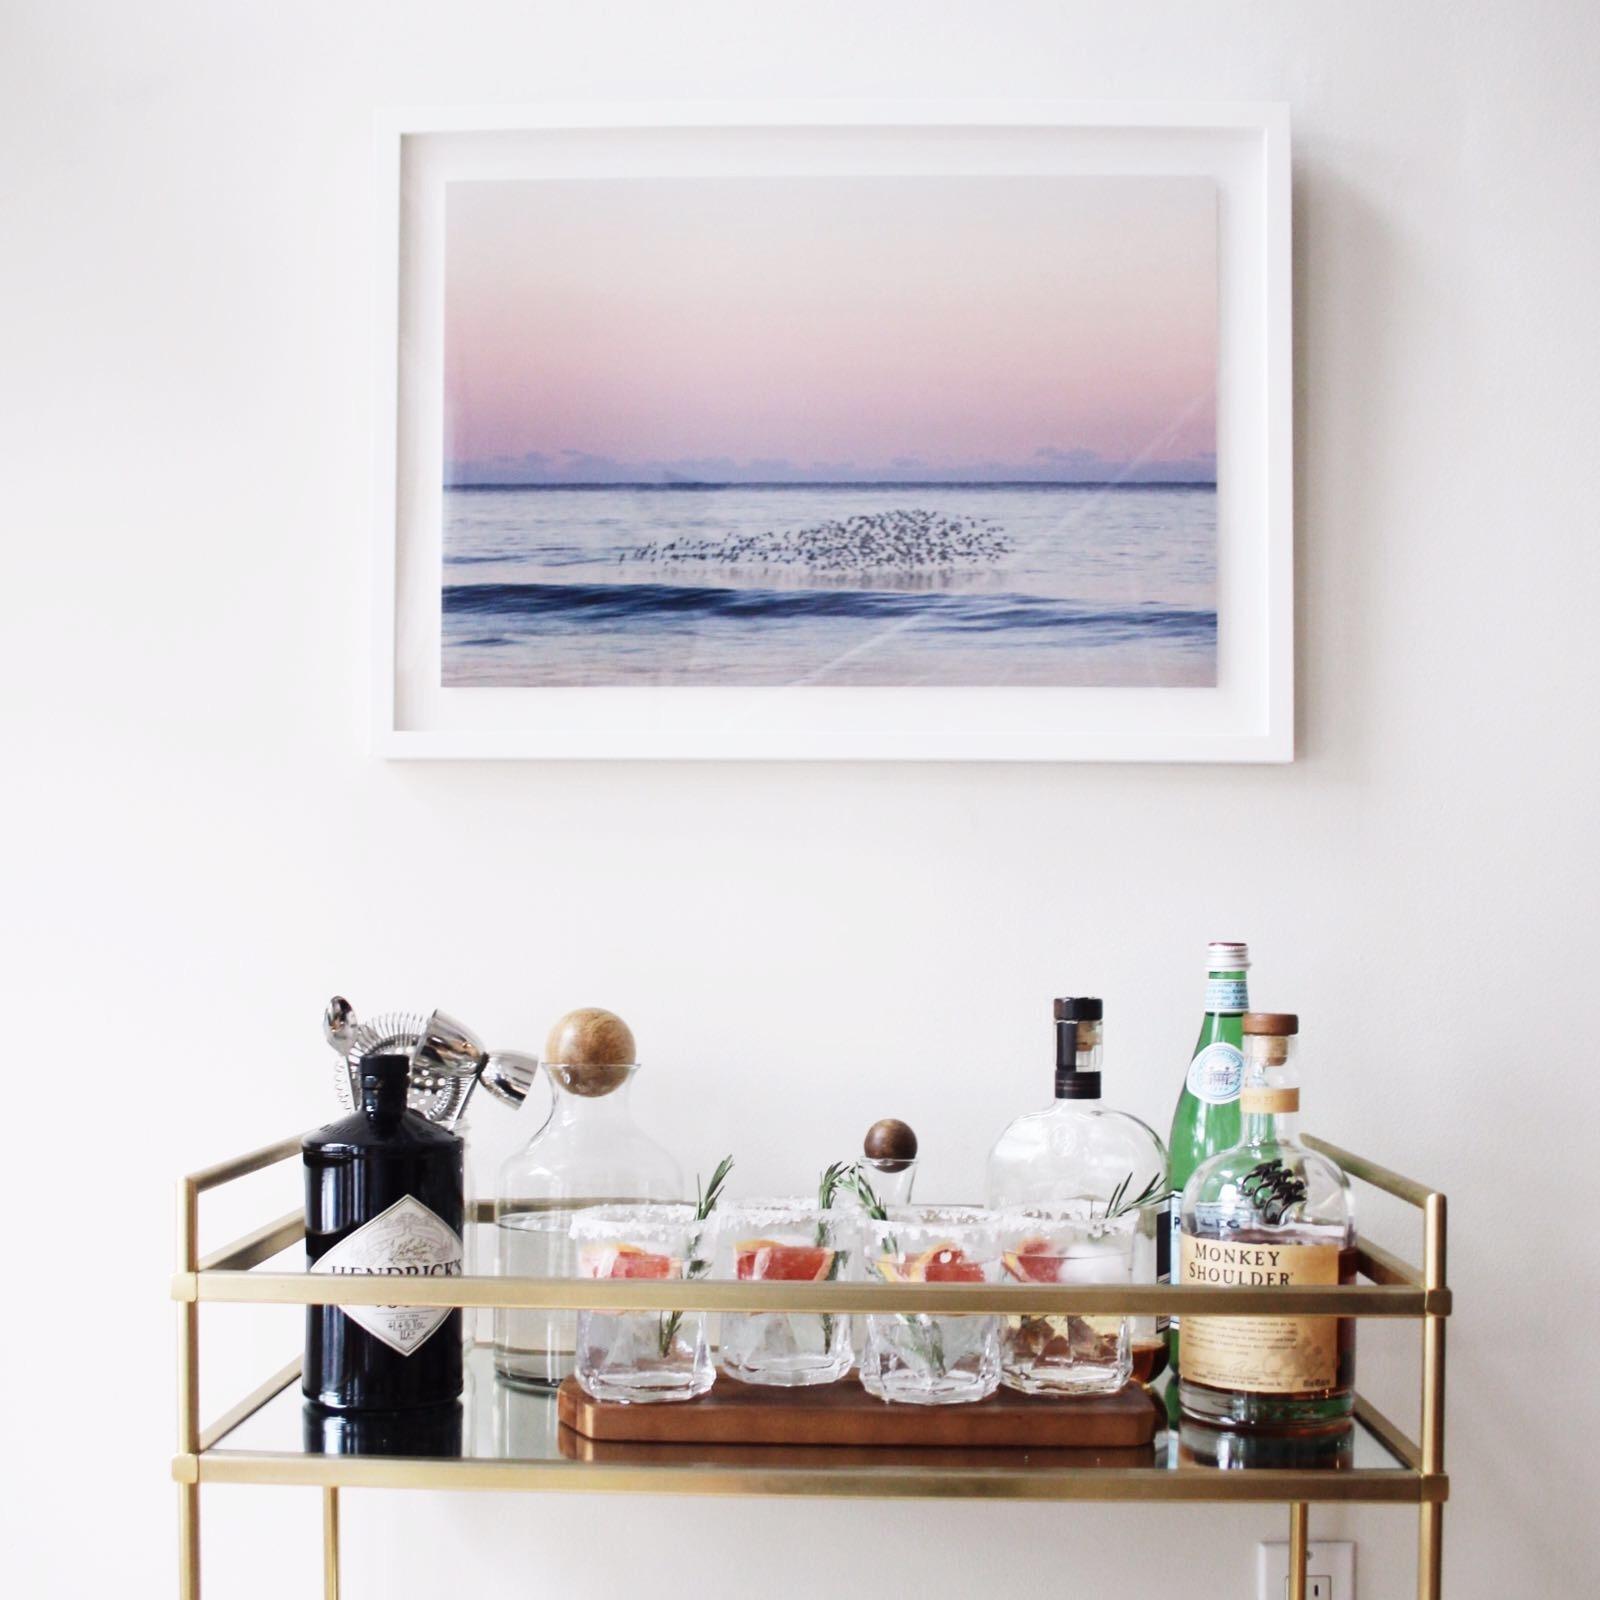 Print: Lauren Marttila Photography ; Bar Cart: West Elm ; Glasses: West Elm